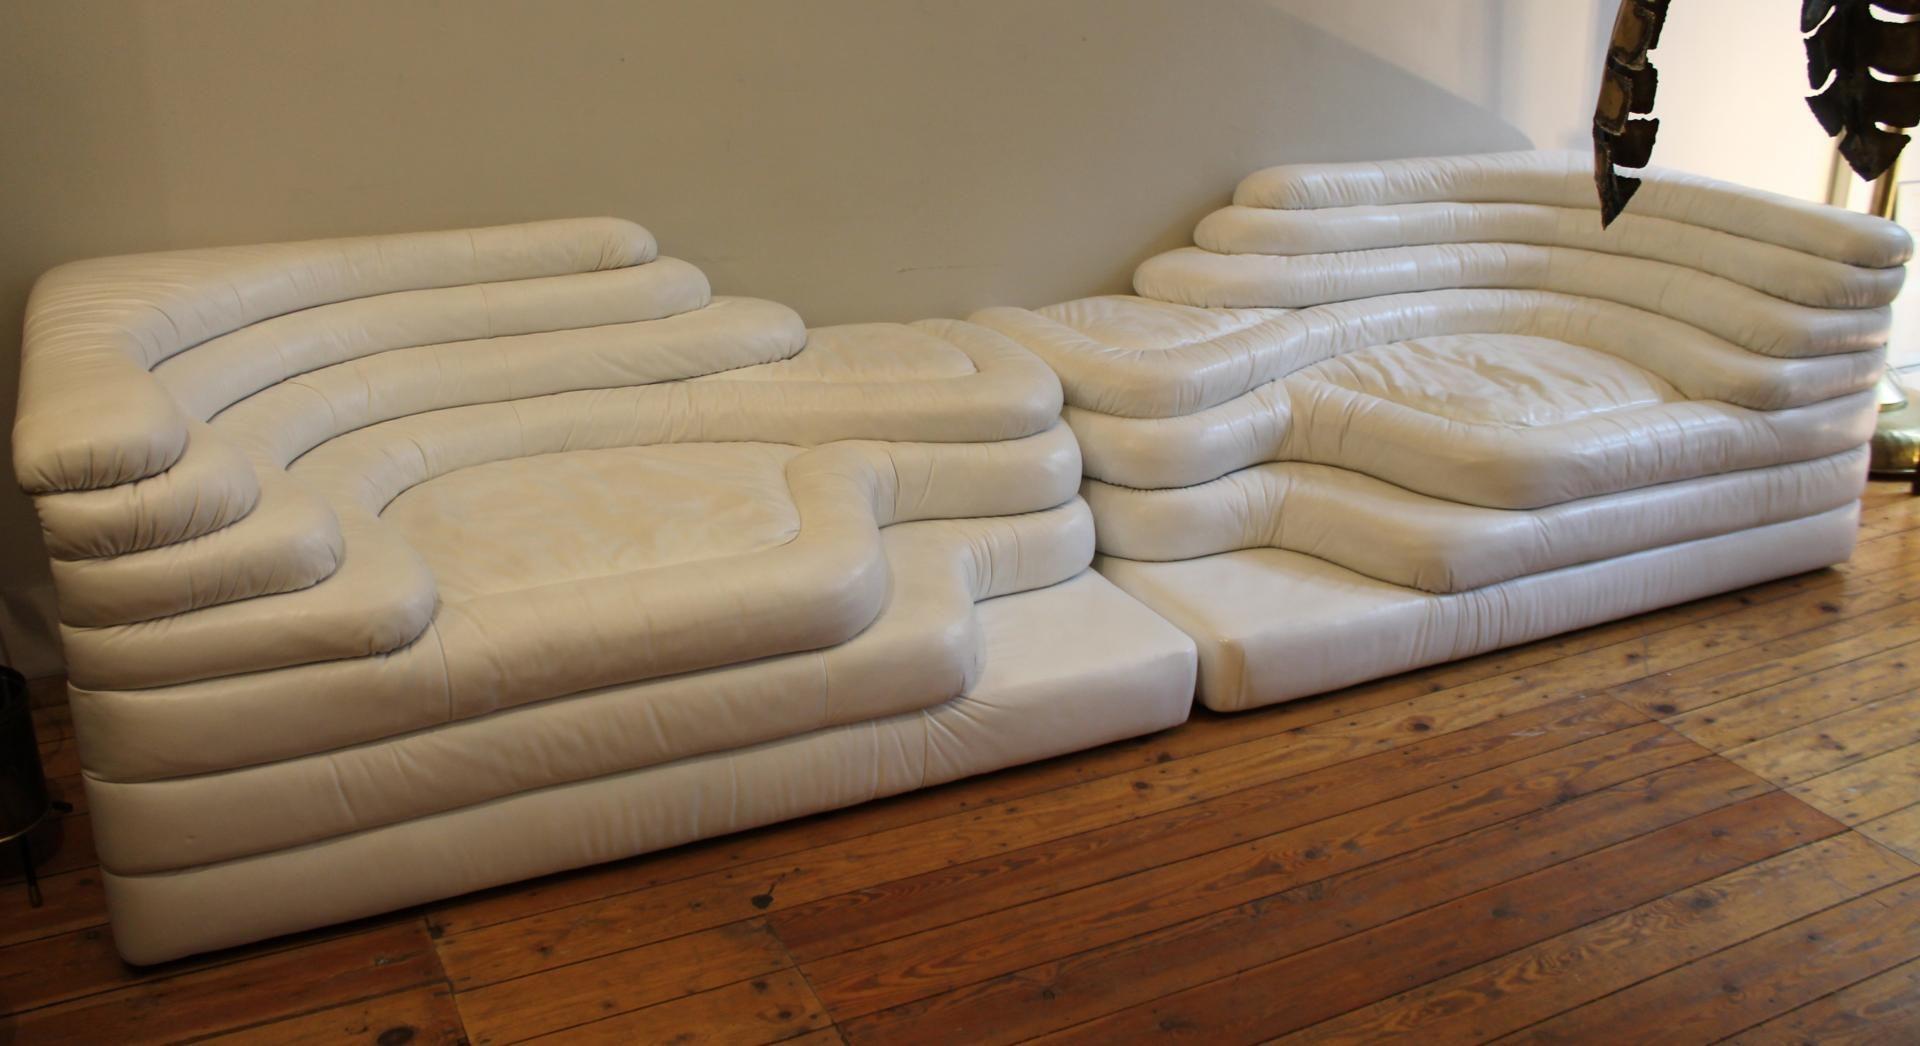 ds 1025 terrazza sofas by ubald klug for de sede 1970s. Black Bedroom Furniture Sets. Home Design Ideas